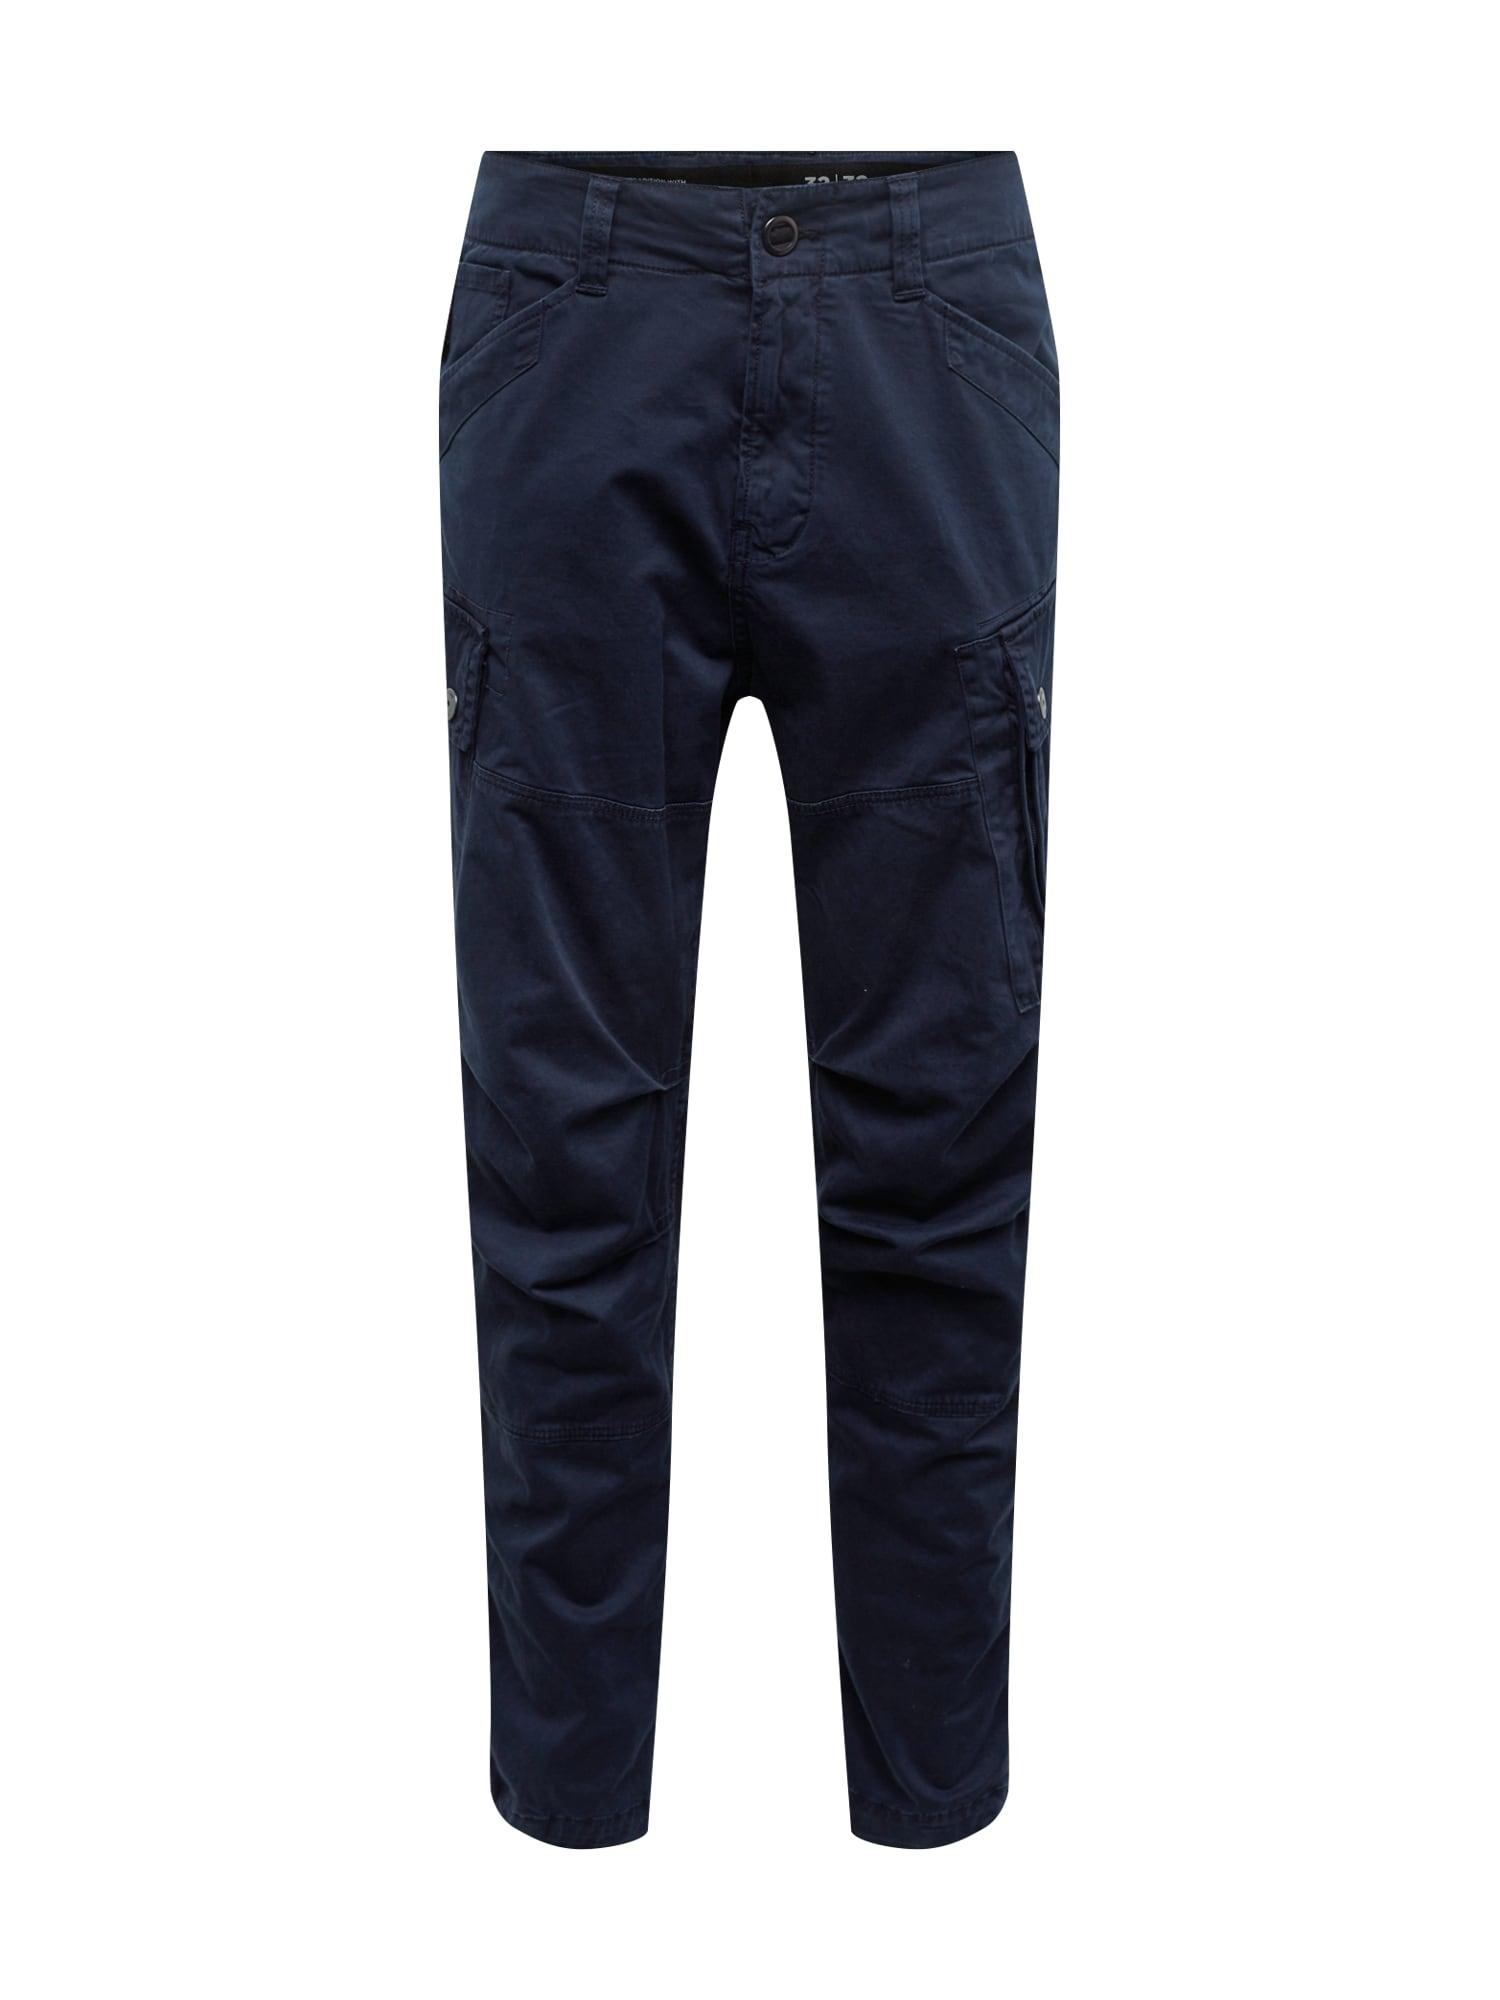 G-Star RAW Laisvo stiliaus kelnės 'Roxic cargo' tamsiai mėlyna